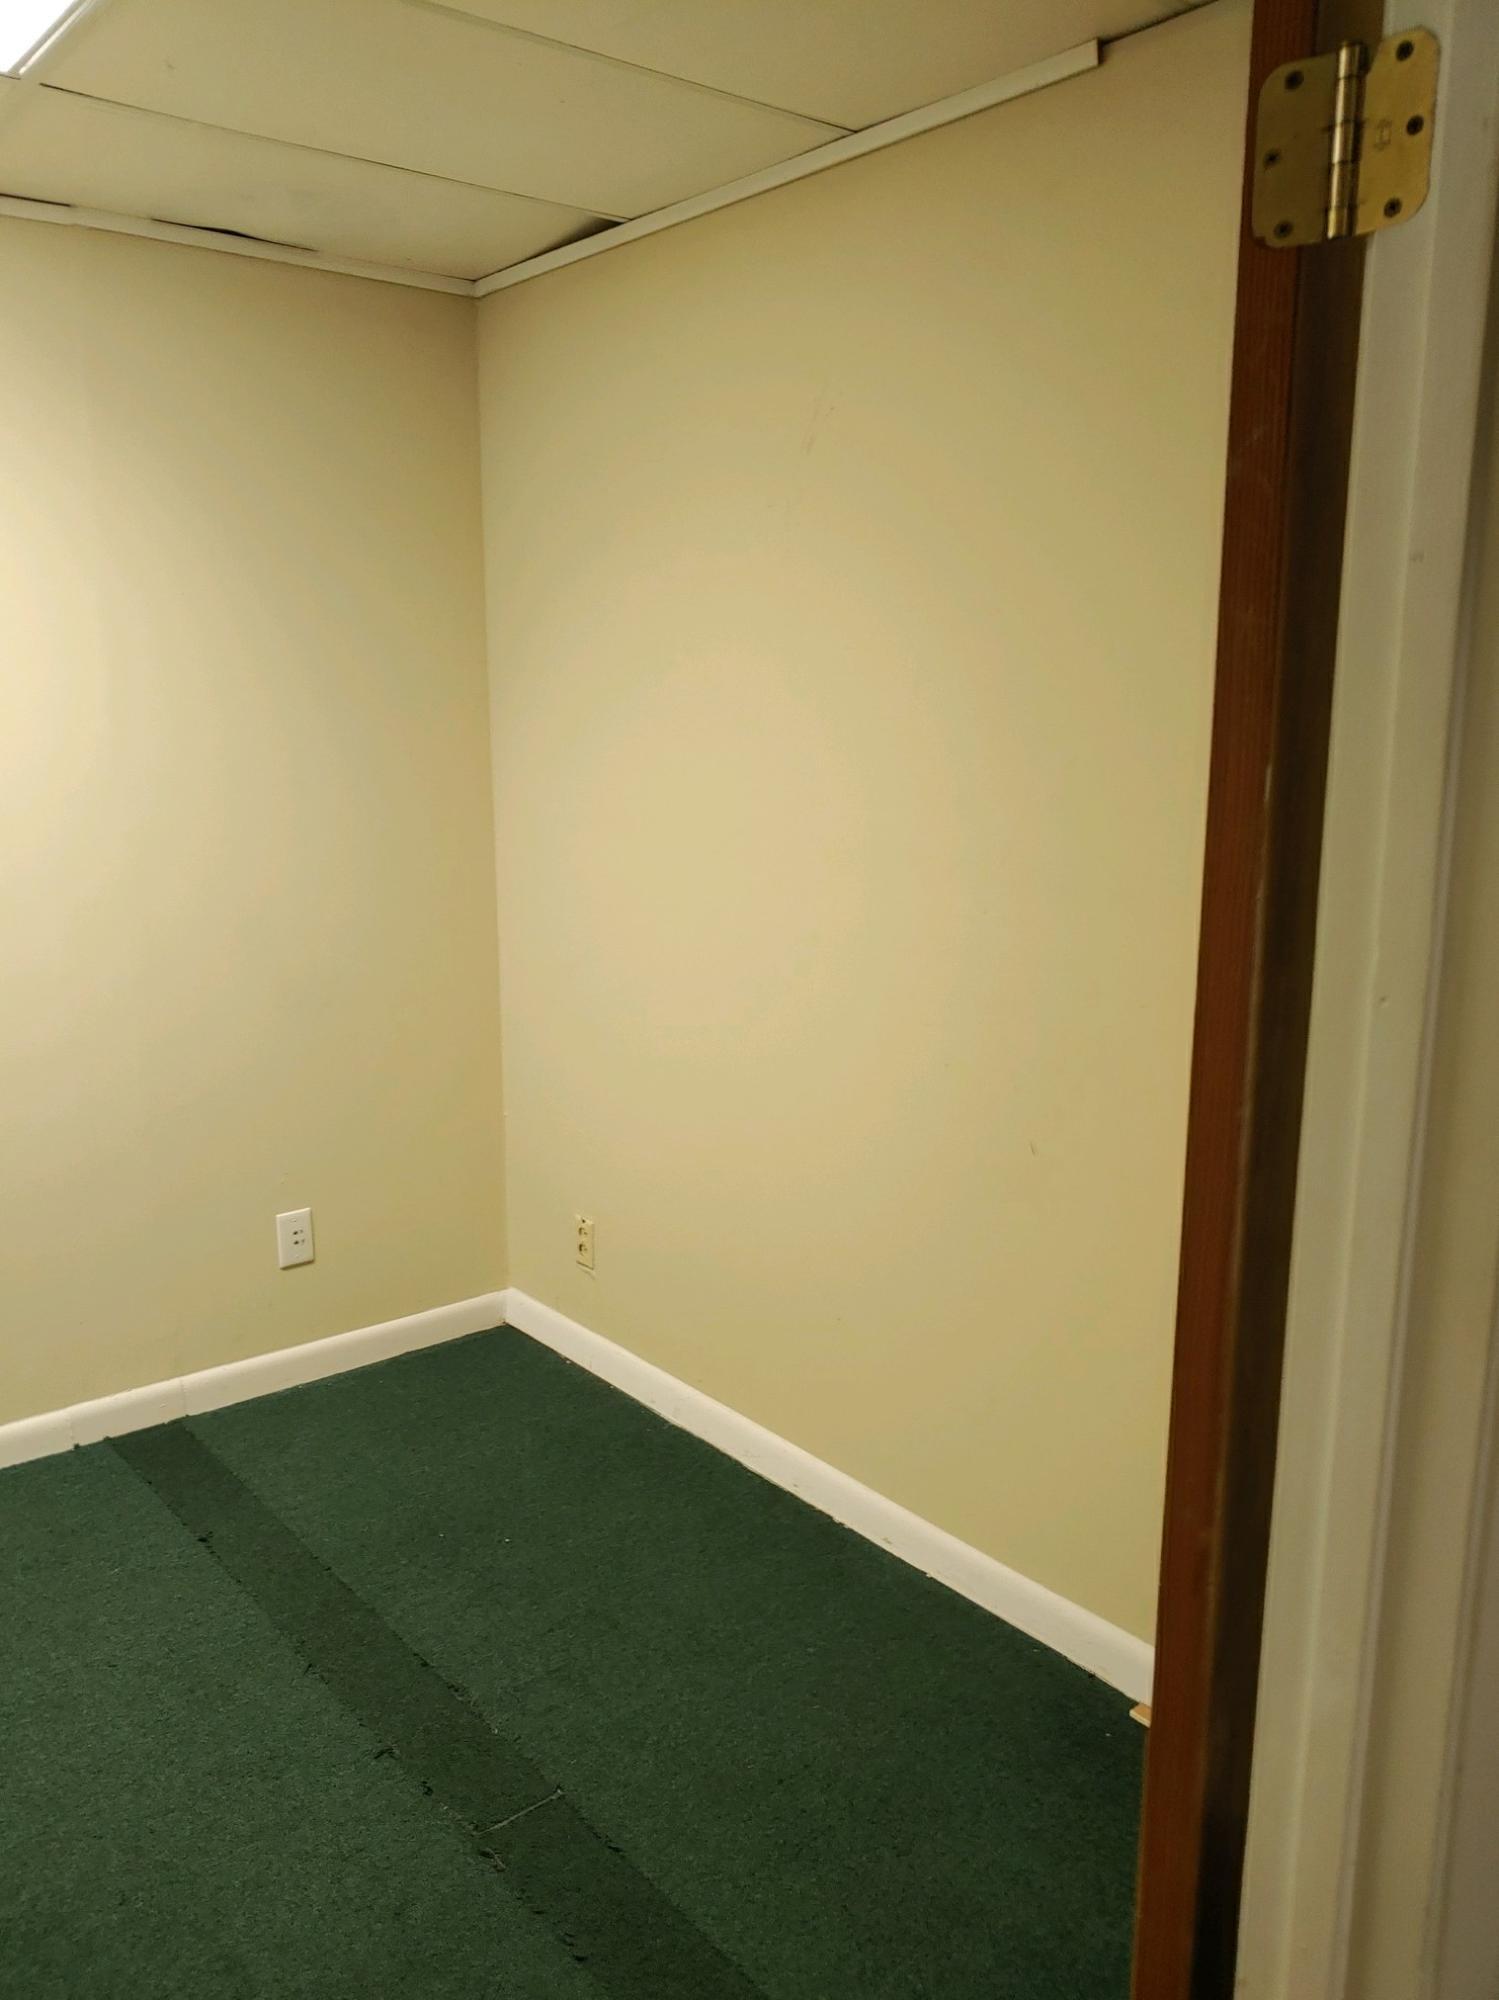 4699 Federal Highway, Pompano Beach, Florida 33064, ,2 BathroomsBathrooms,Office,For Sale,Federal,RX-10676981